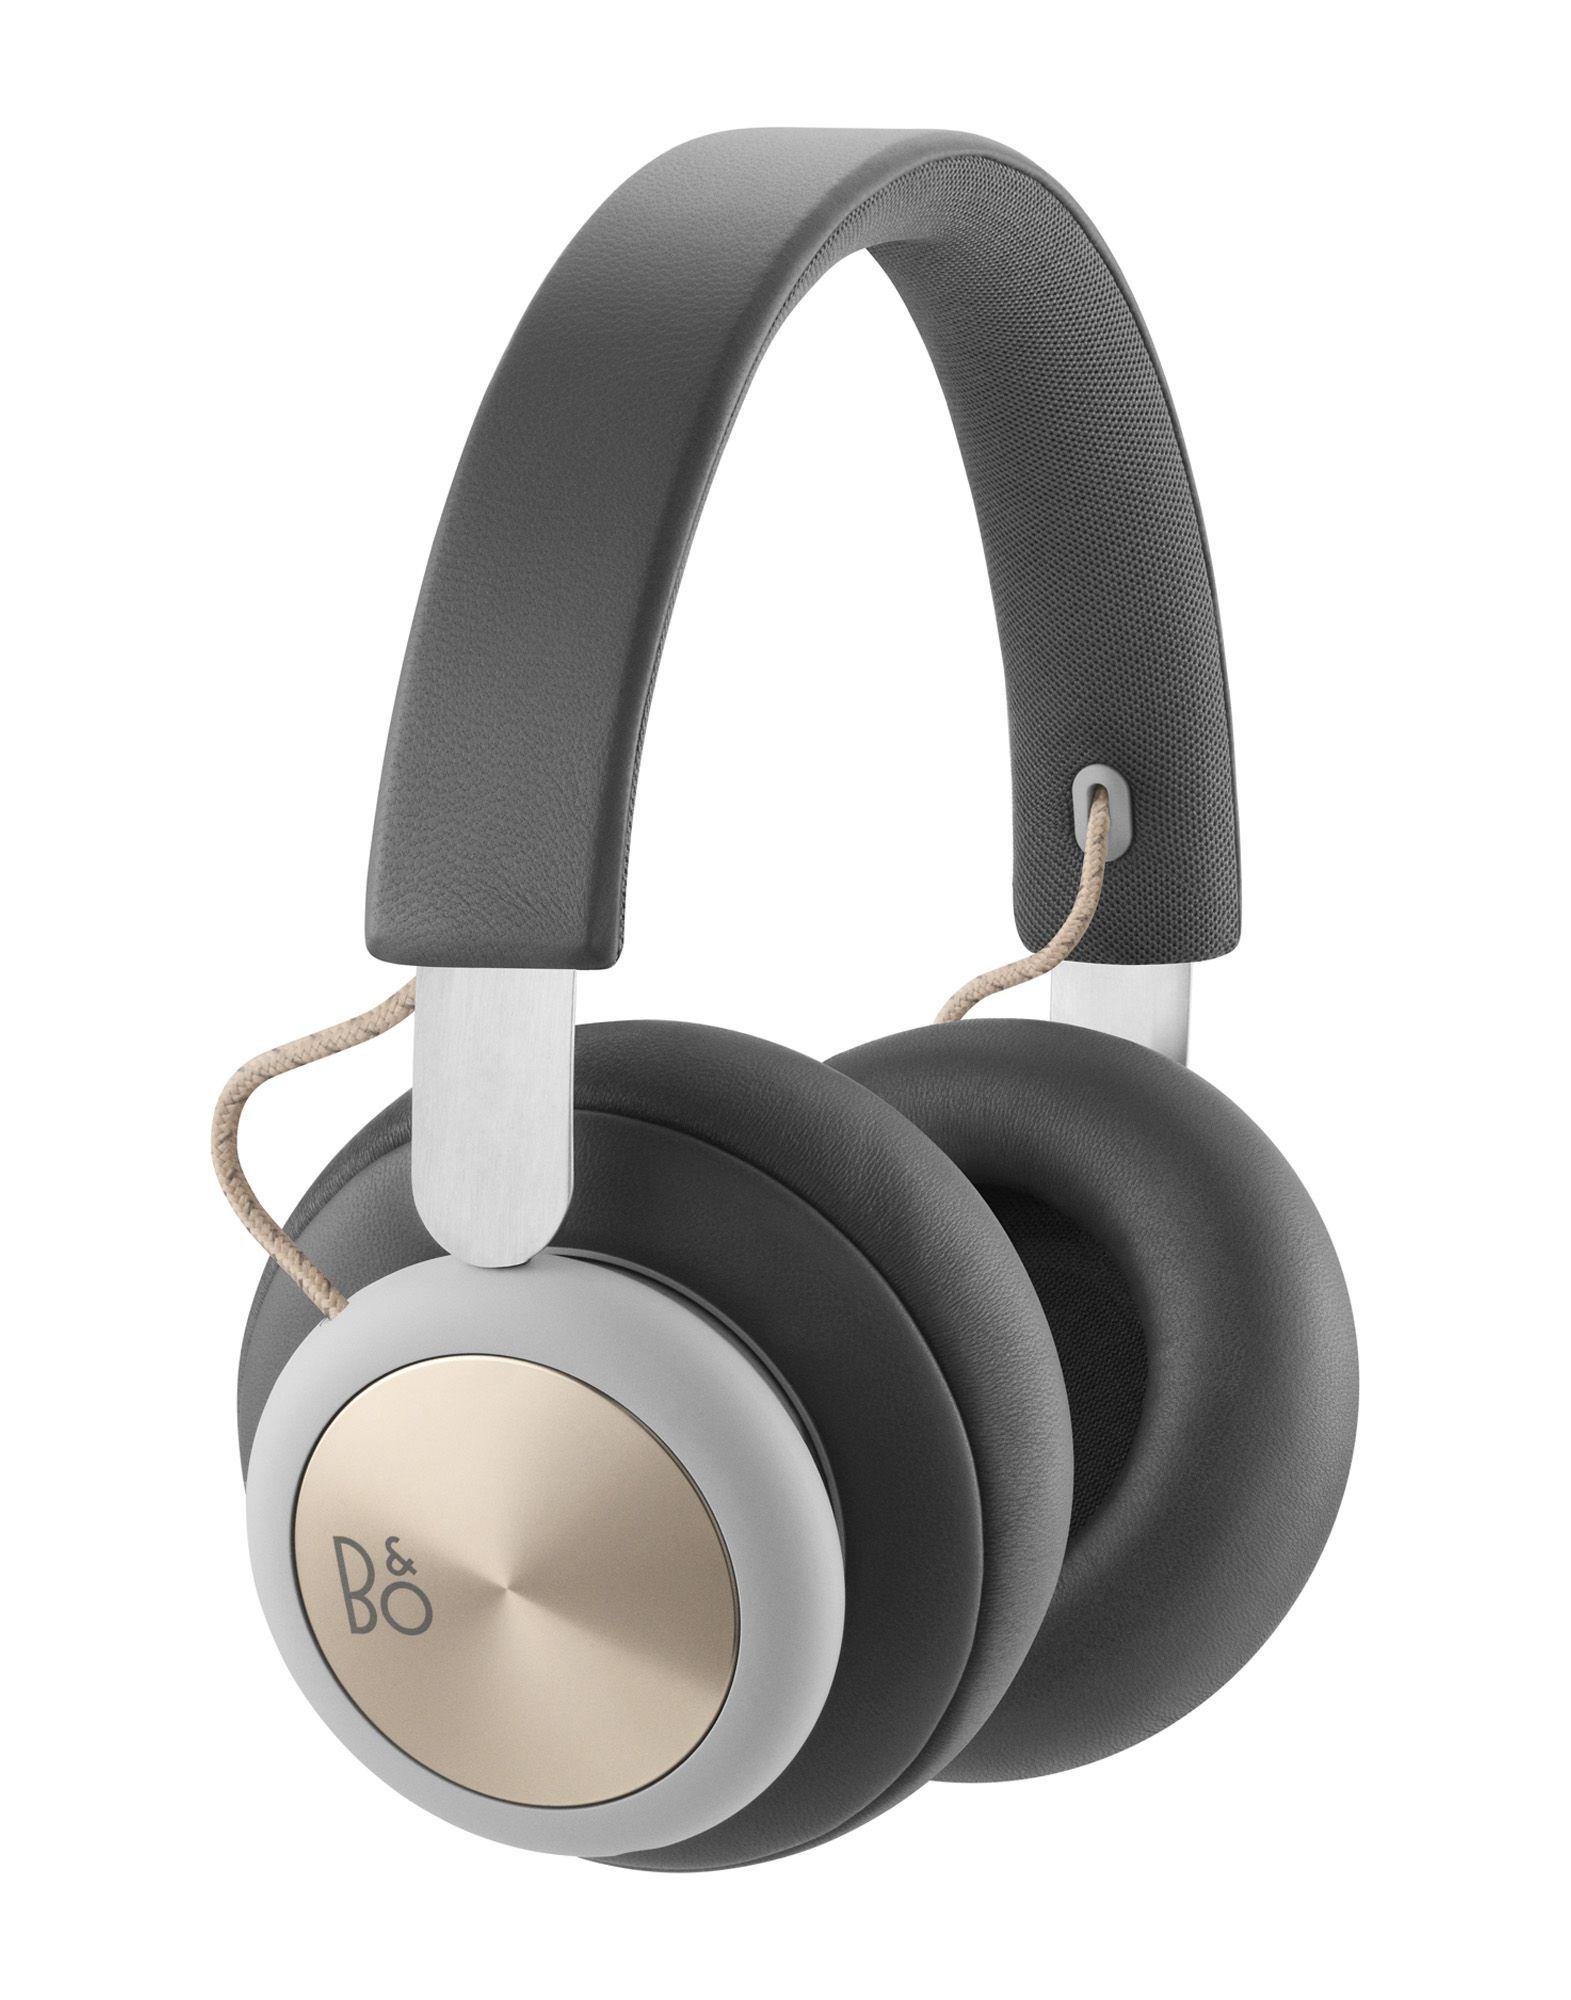 B&O PLAY Unisex Kopfhörer Farbe Hellgrau Größe 1 jetztbilligerkaufen